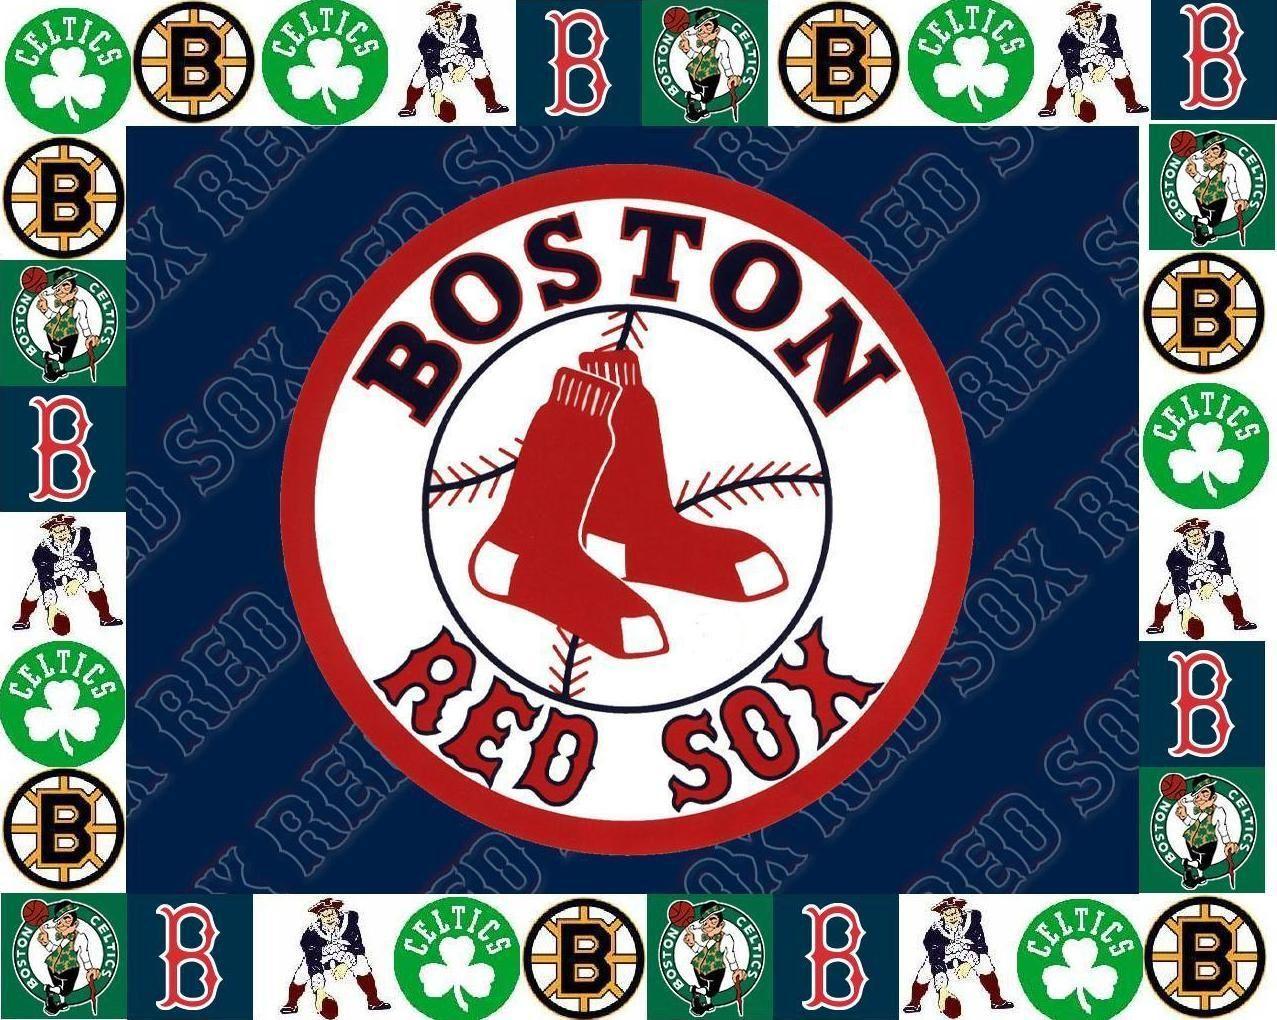 Sport Logo Iphone Wallpaper: Boston Sports Teams Wallpapers (40 Wallpapers)